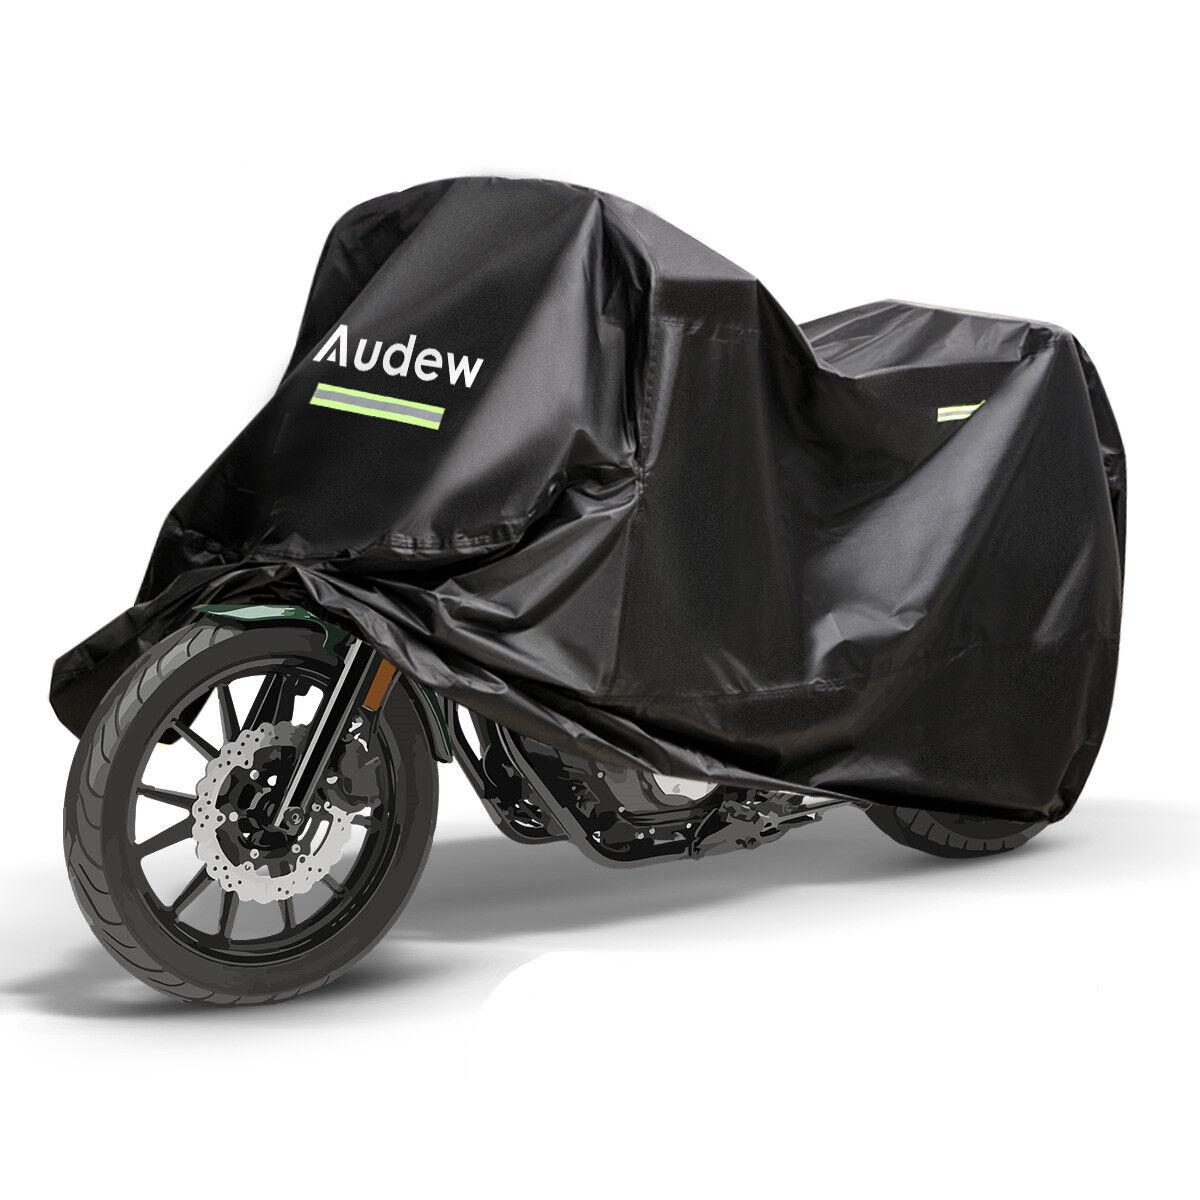 Audew Motorcycle Rain Cover Protective Breathable UV-Proof Waterproof